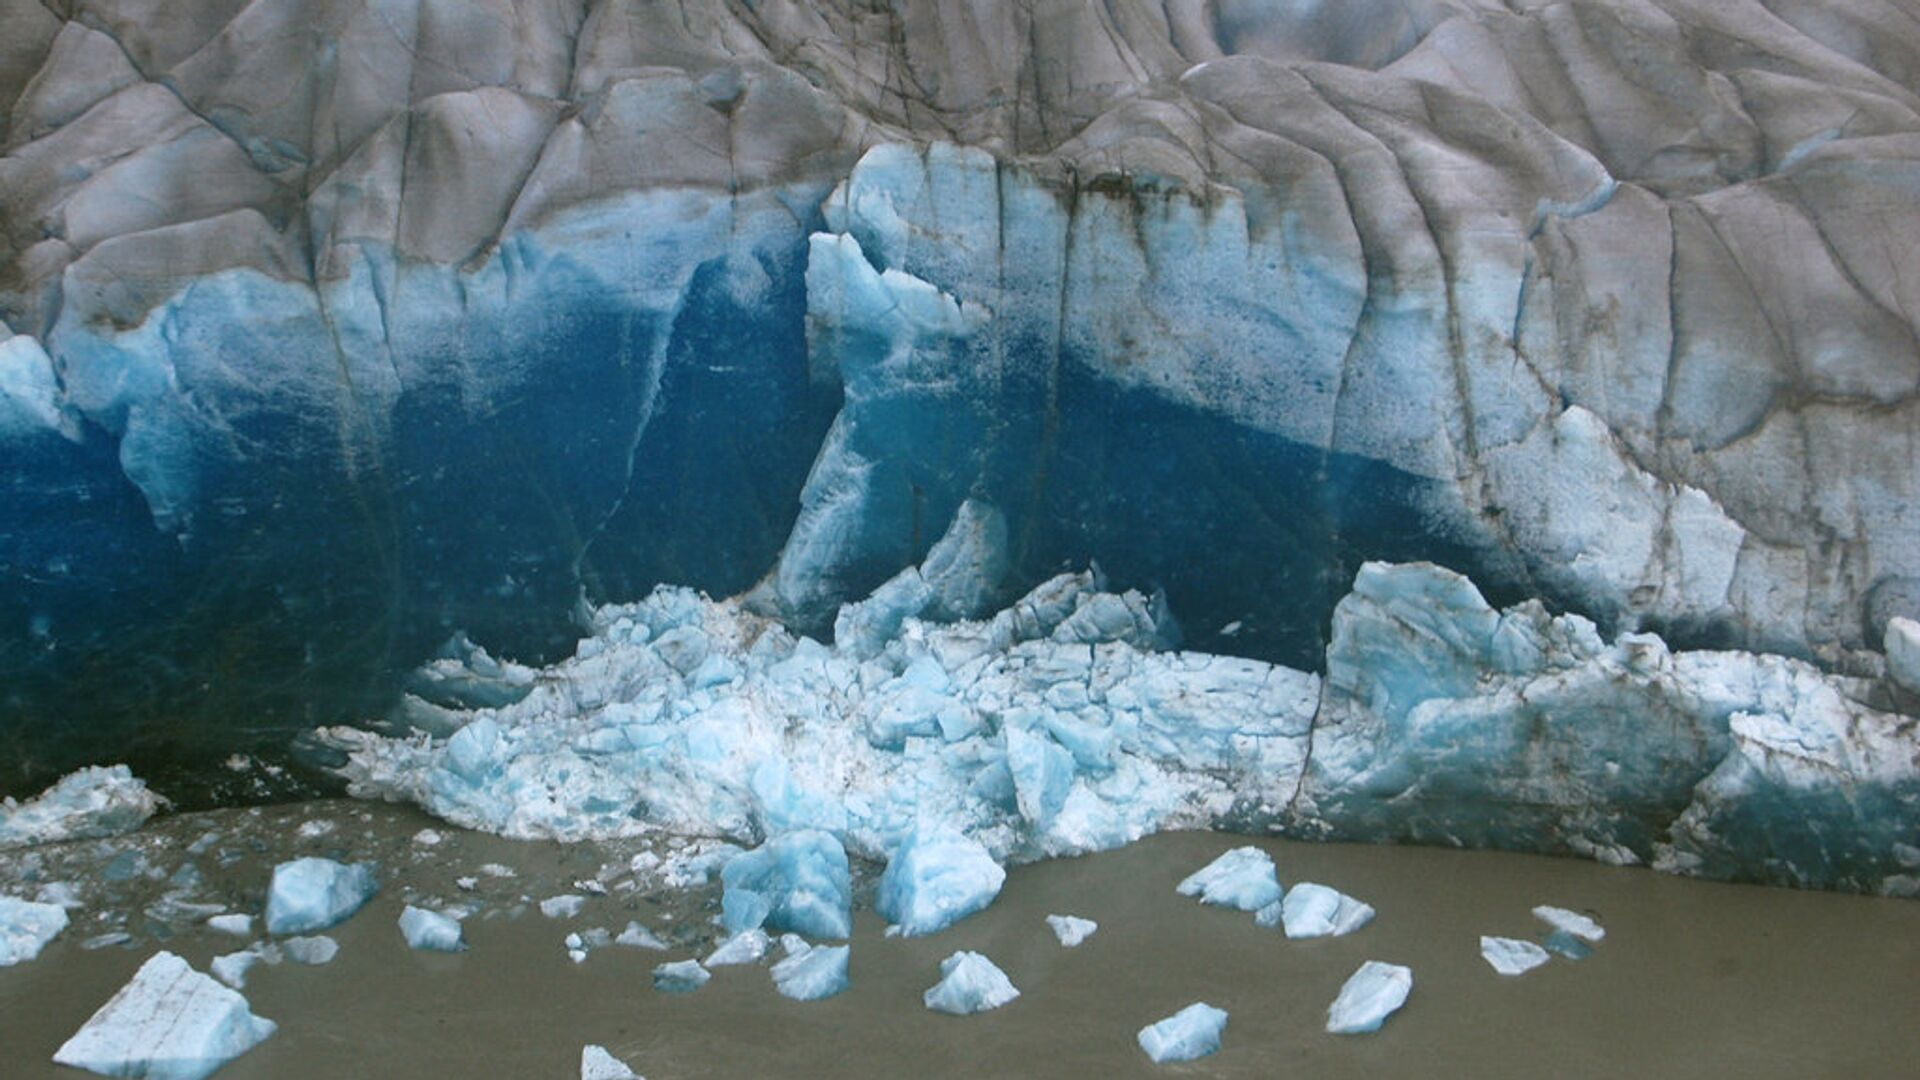 Ледник Аляски - РИА Новости, 1920, 19.10.2020